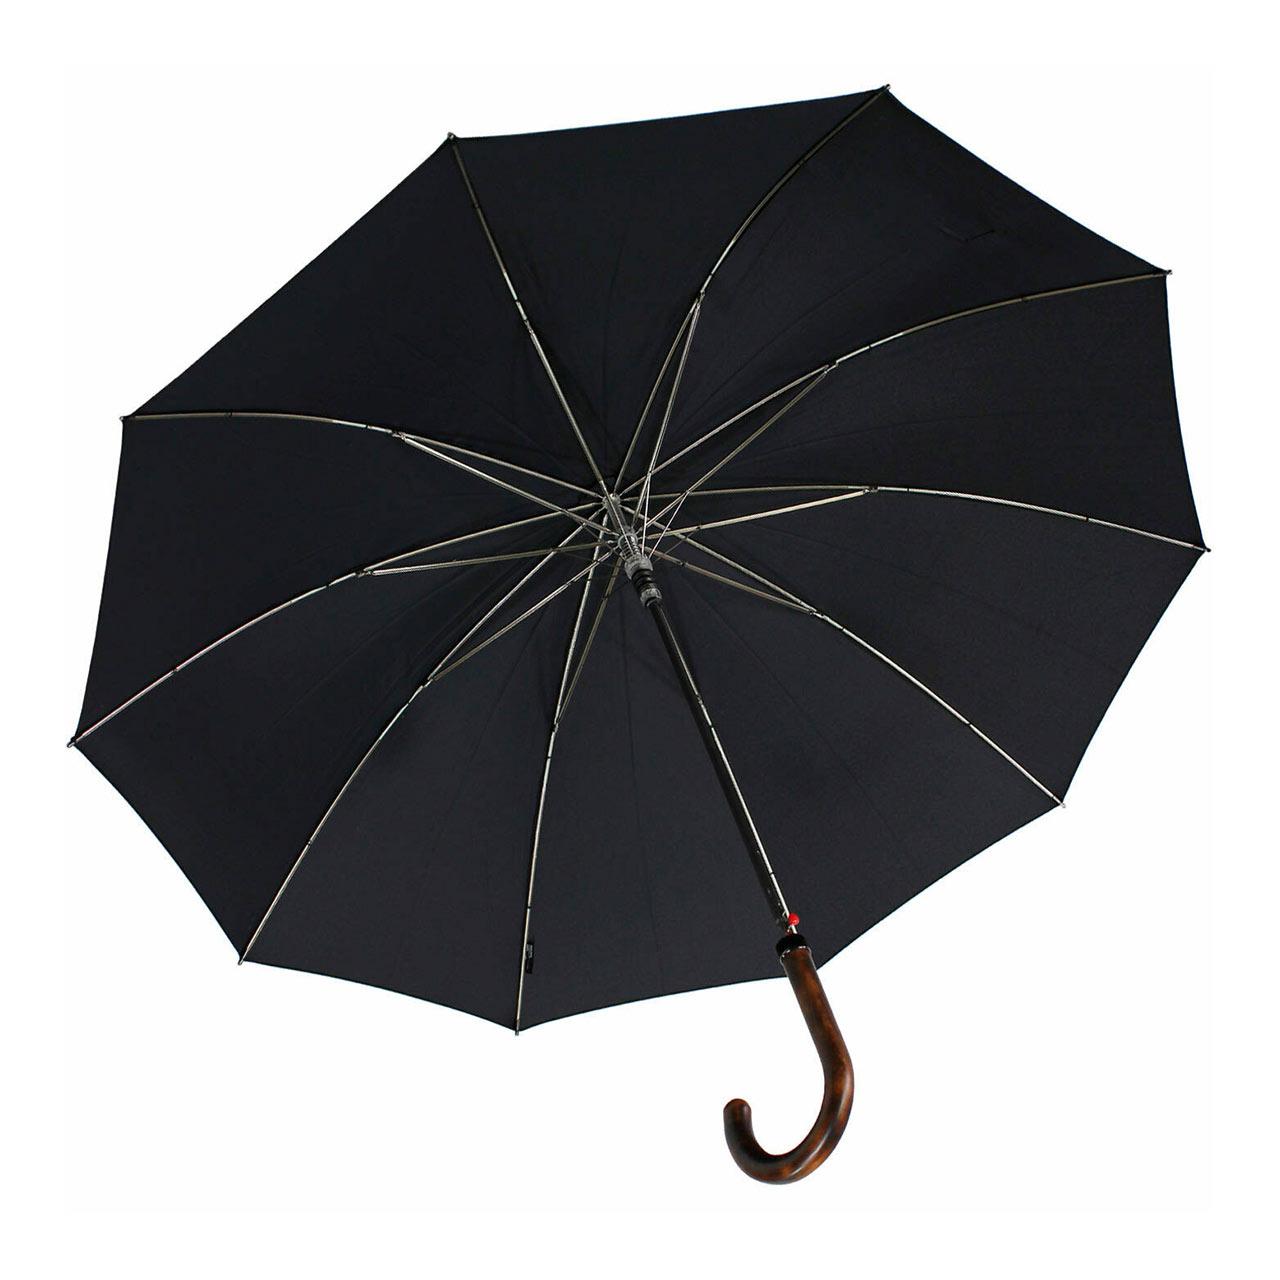 KNIRPS stick umbrella SL 923 Black | the design gift shop